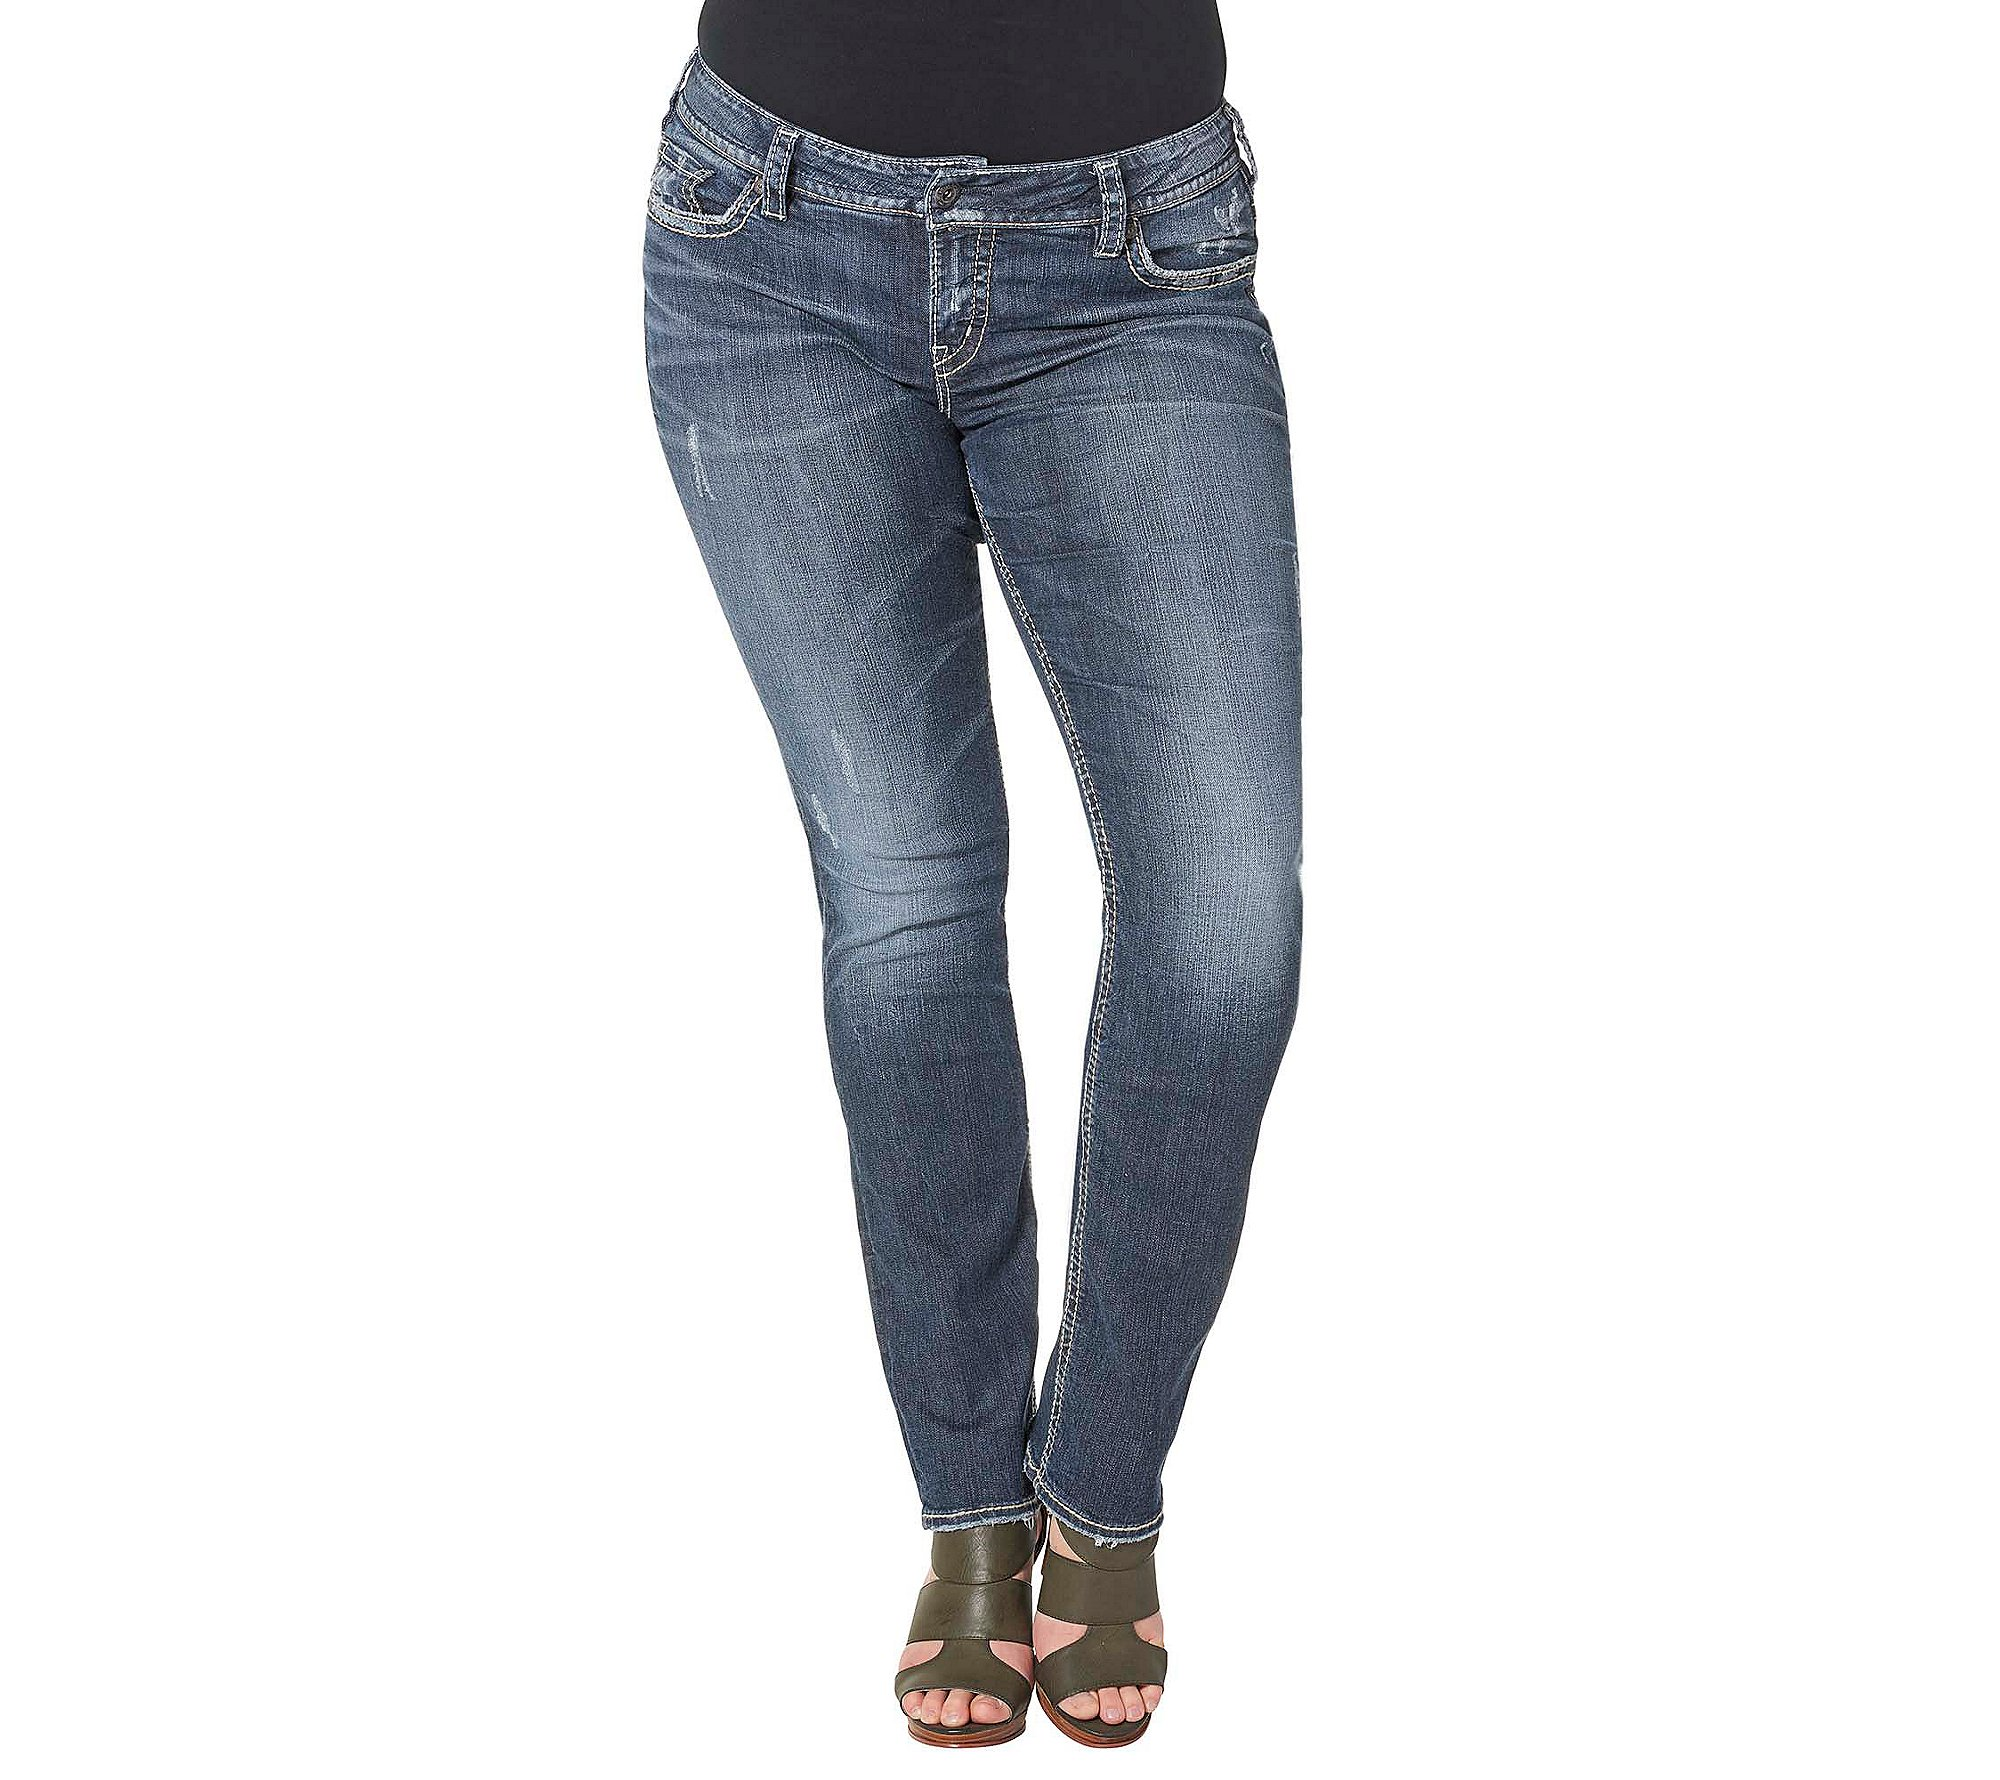 Silver Jeans Co. Women's Plus Size Suki Curvy Fit Mid Rise Straight Leg Jeans, Vintage Dark Wash with Lurex Stitch, 14x30